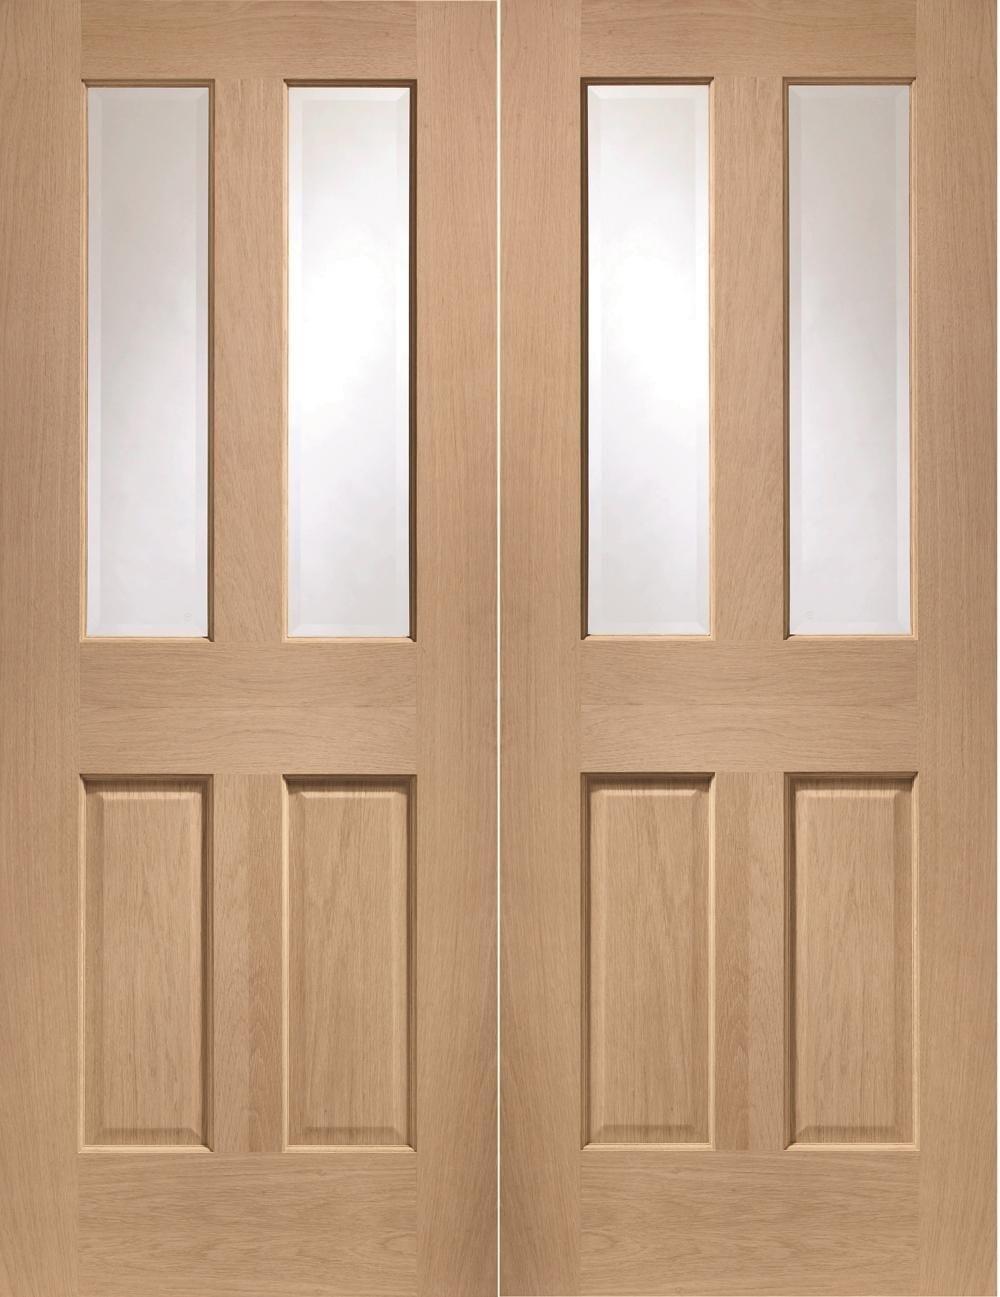 Malton Oak Pair - Clear Glazed  Image